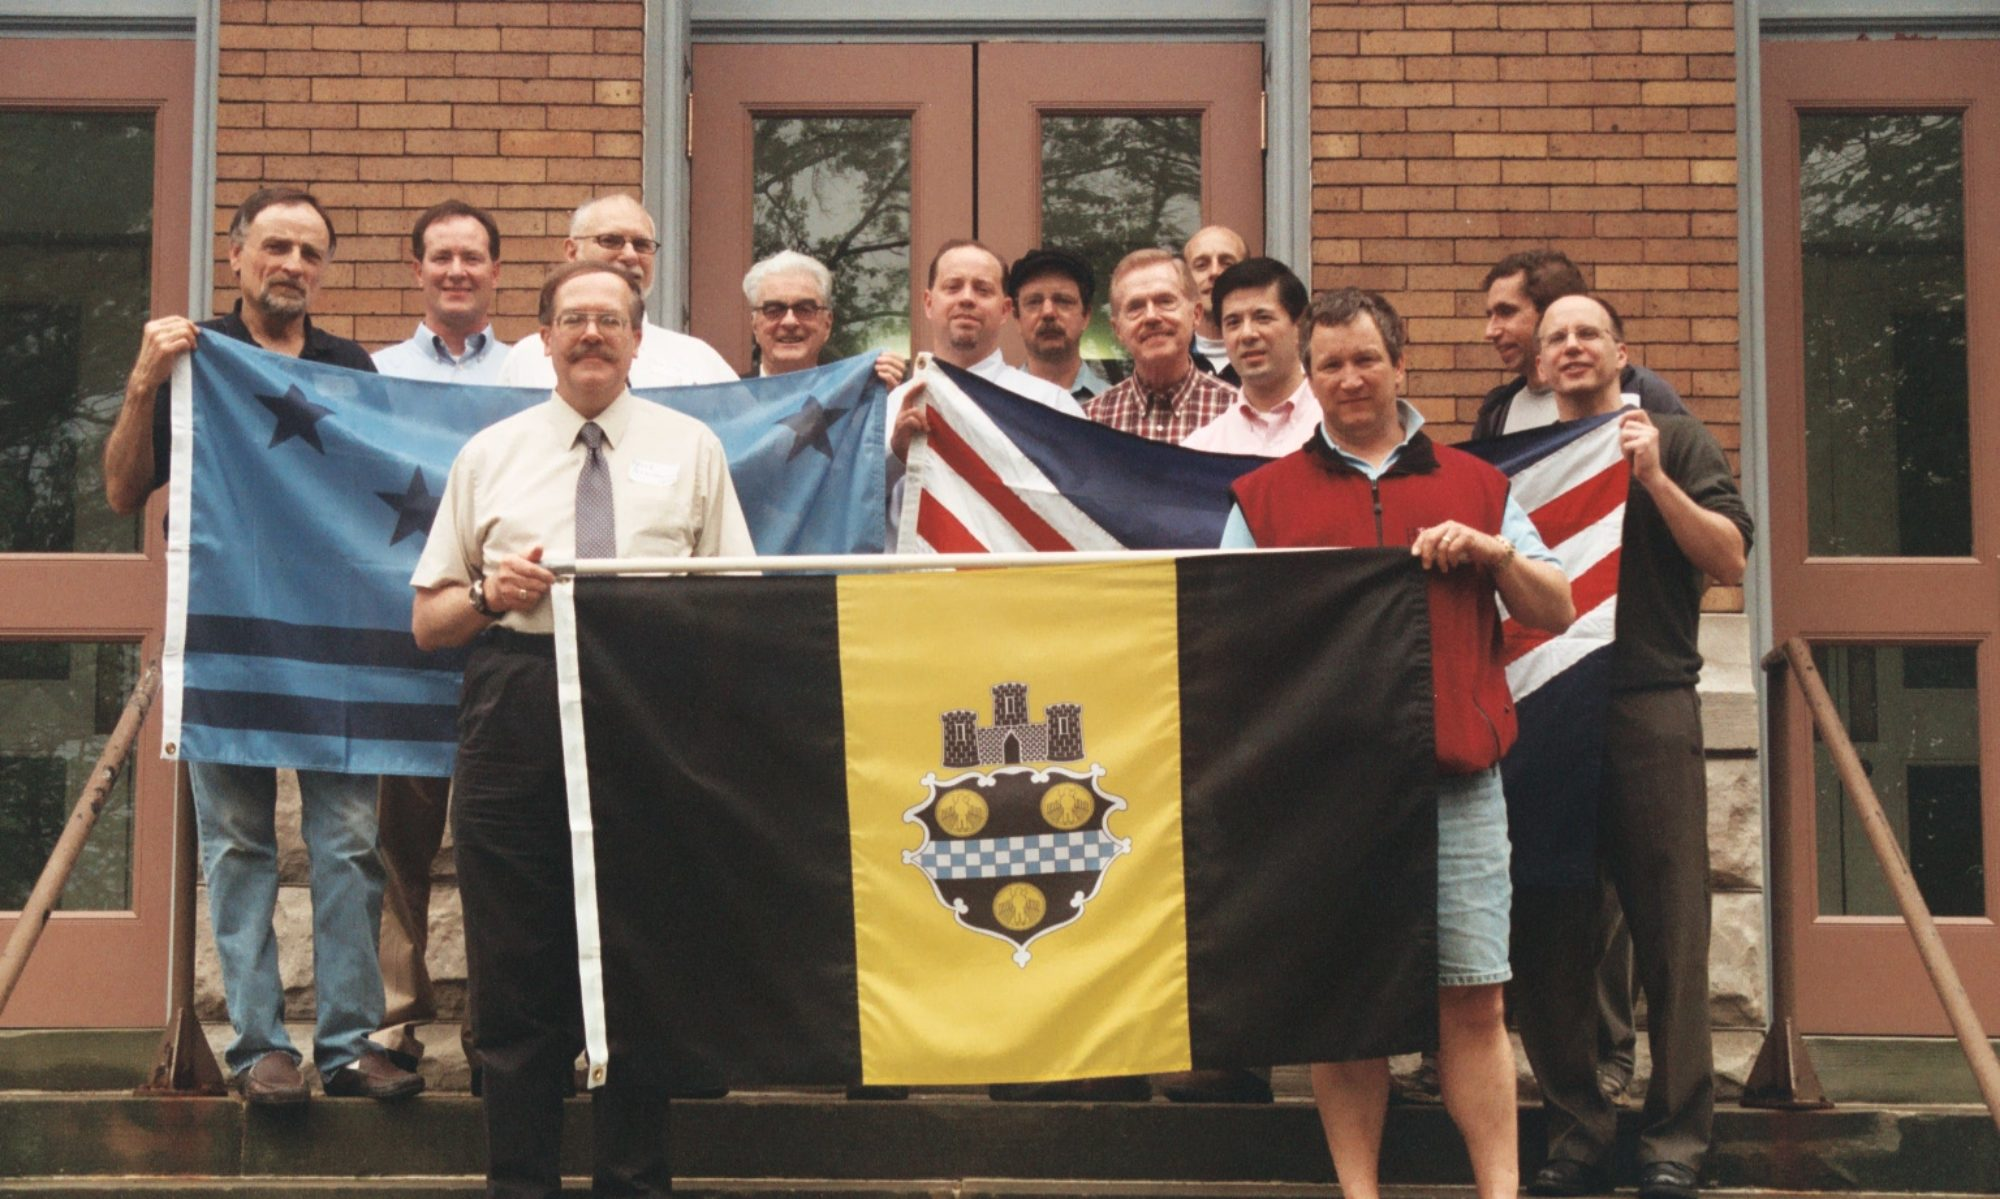 Chesapeake Bay Flag Association